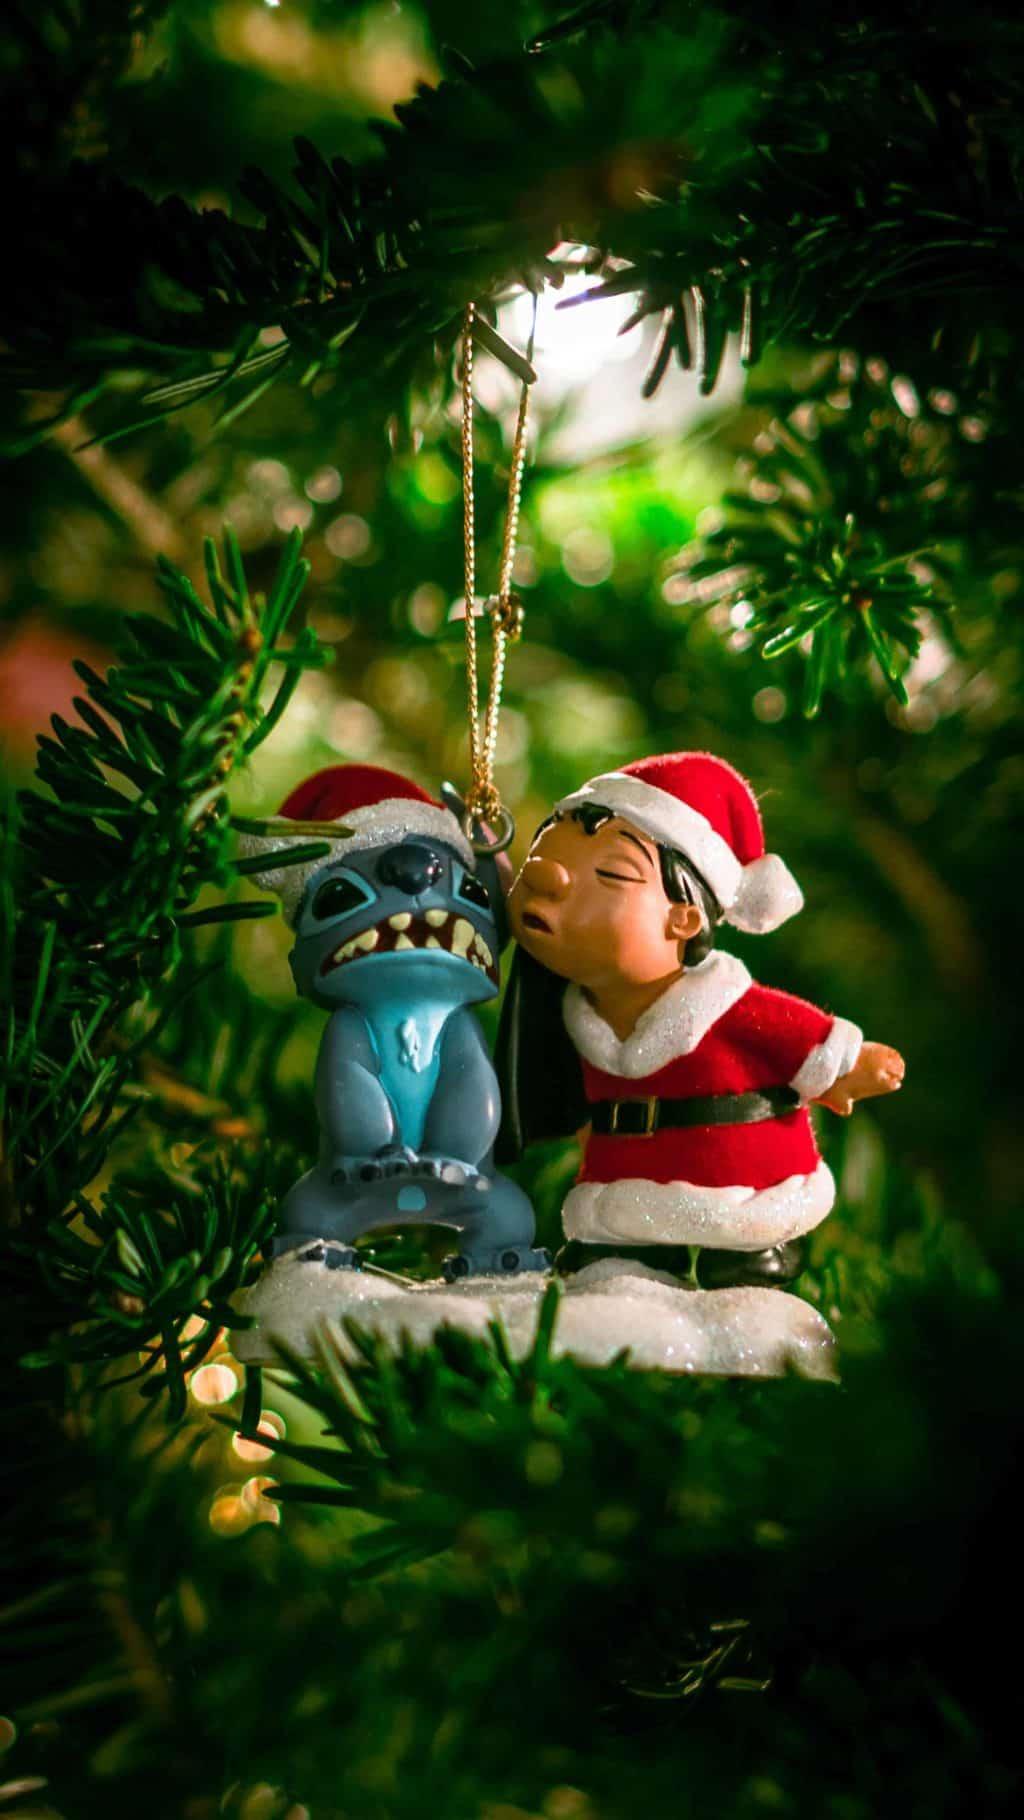 lilo and stitch christmas ornament